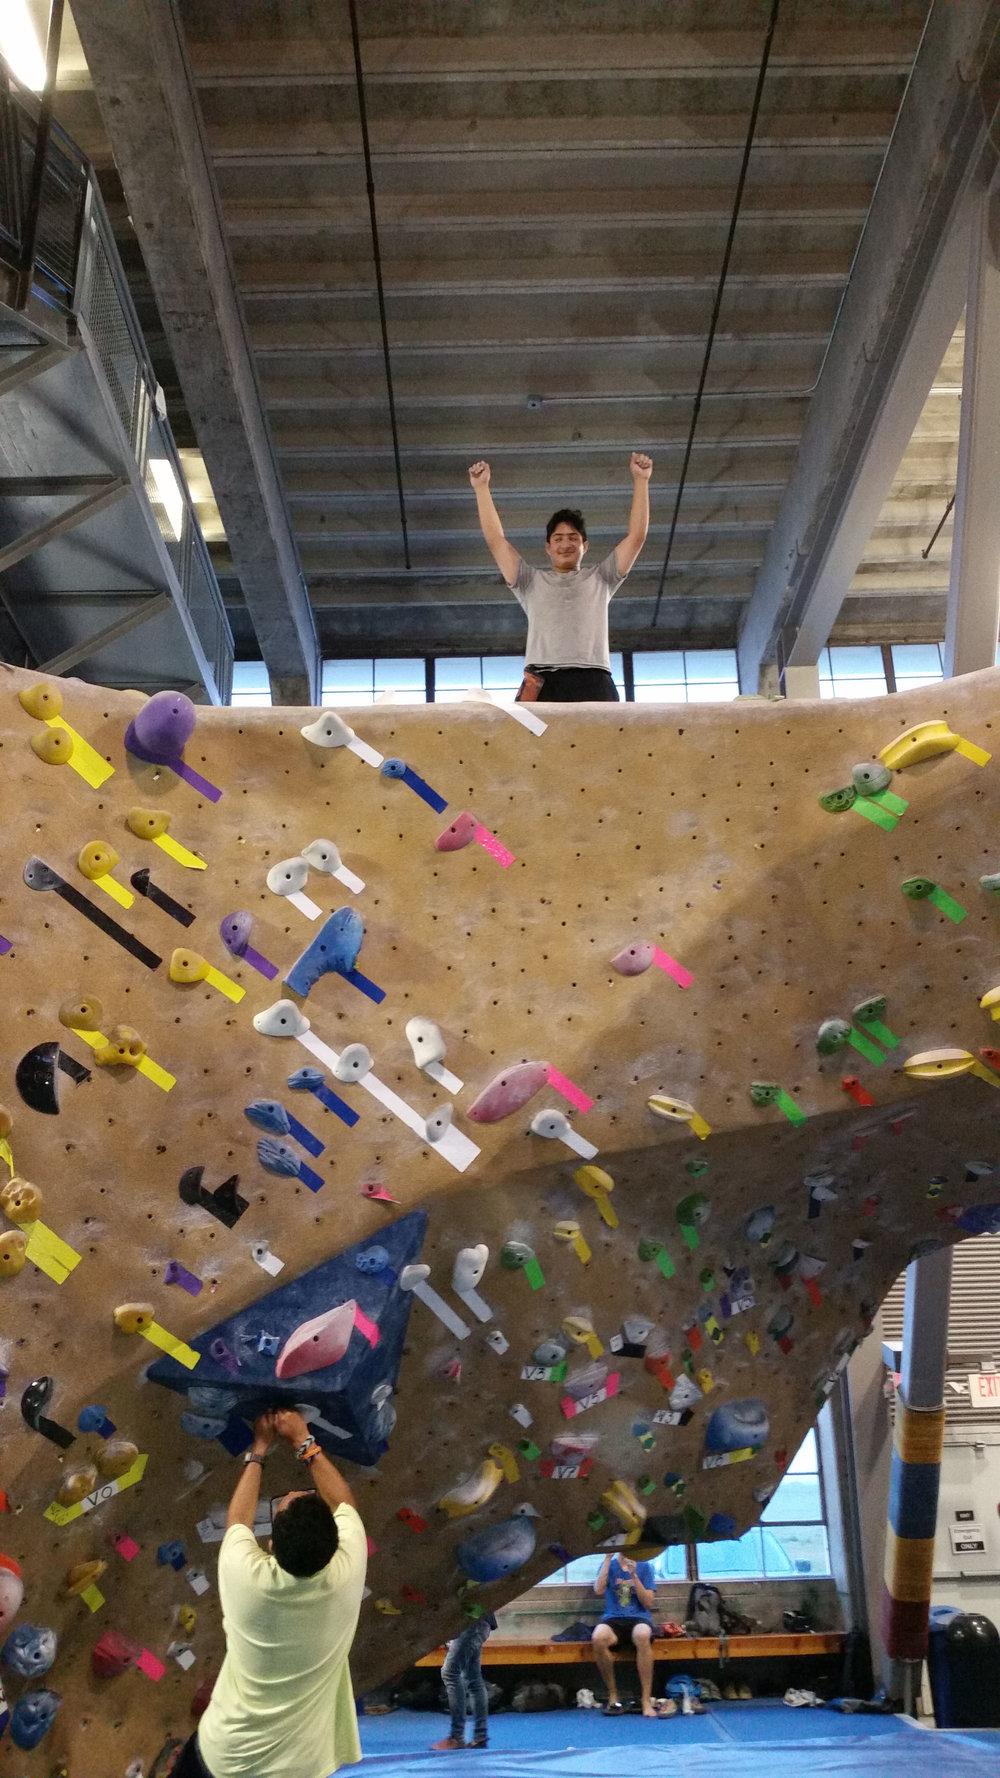 Felix, '19  Rock climbing challenge at Crissy Fields in San Francisco.